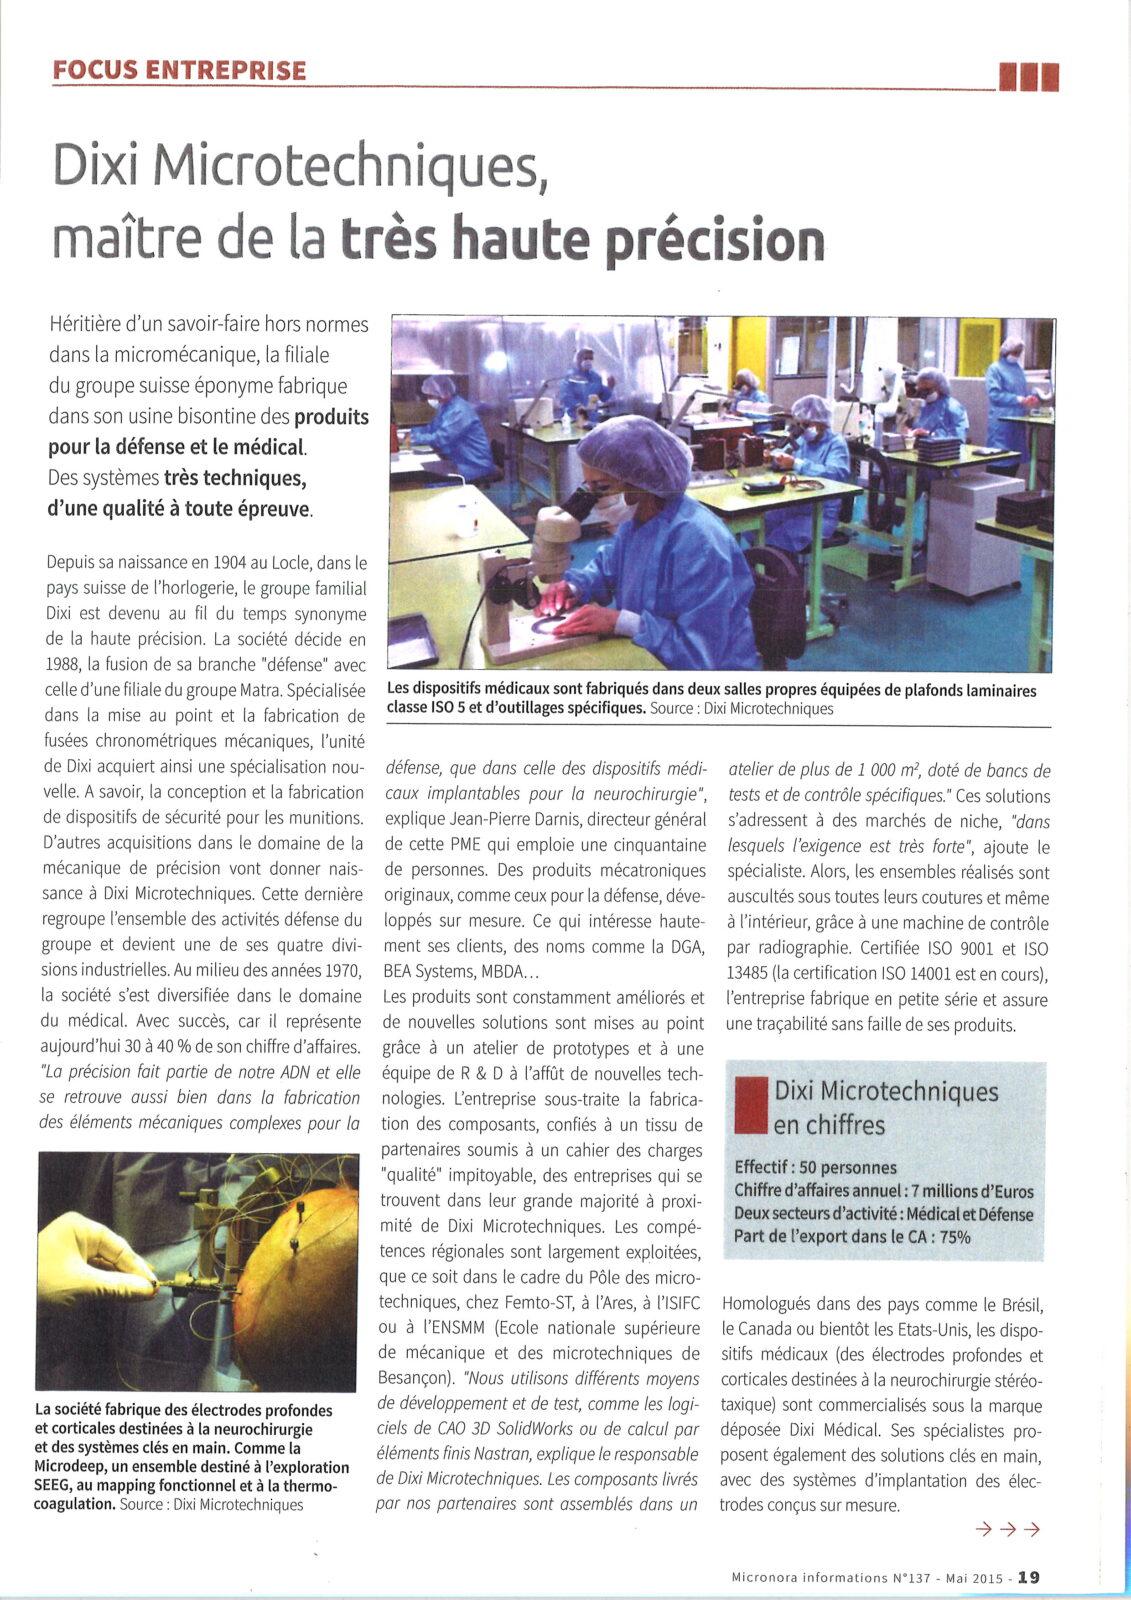 Micronora informations mai 2015